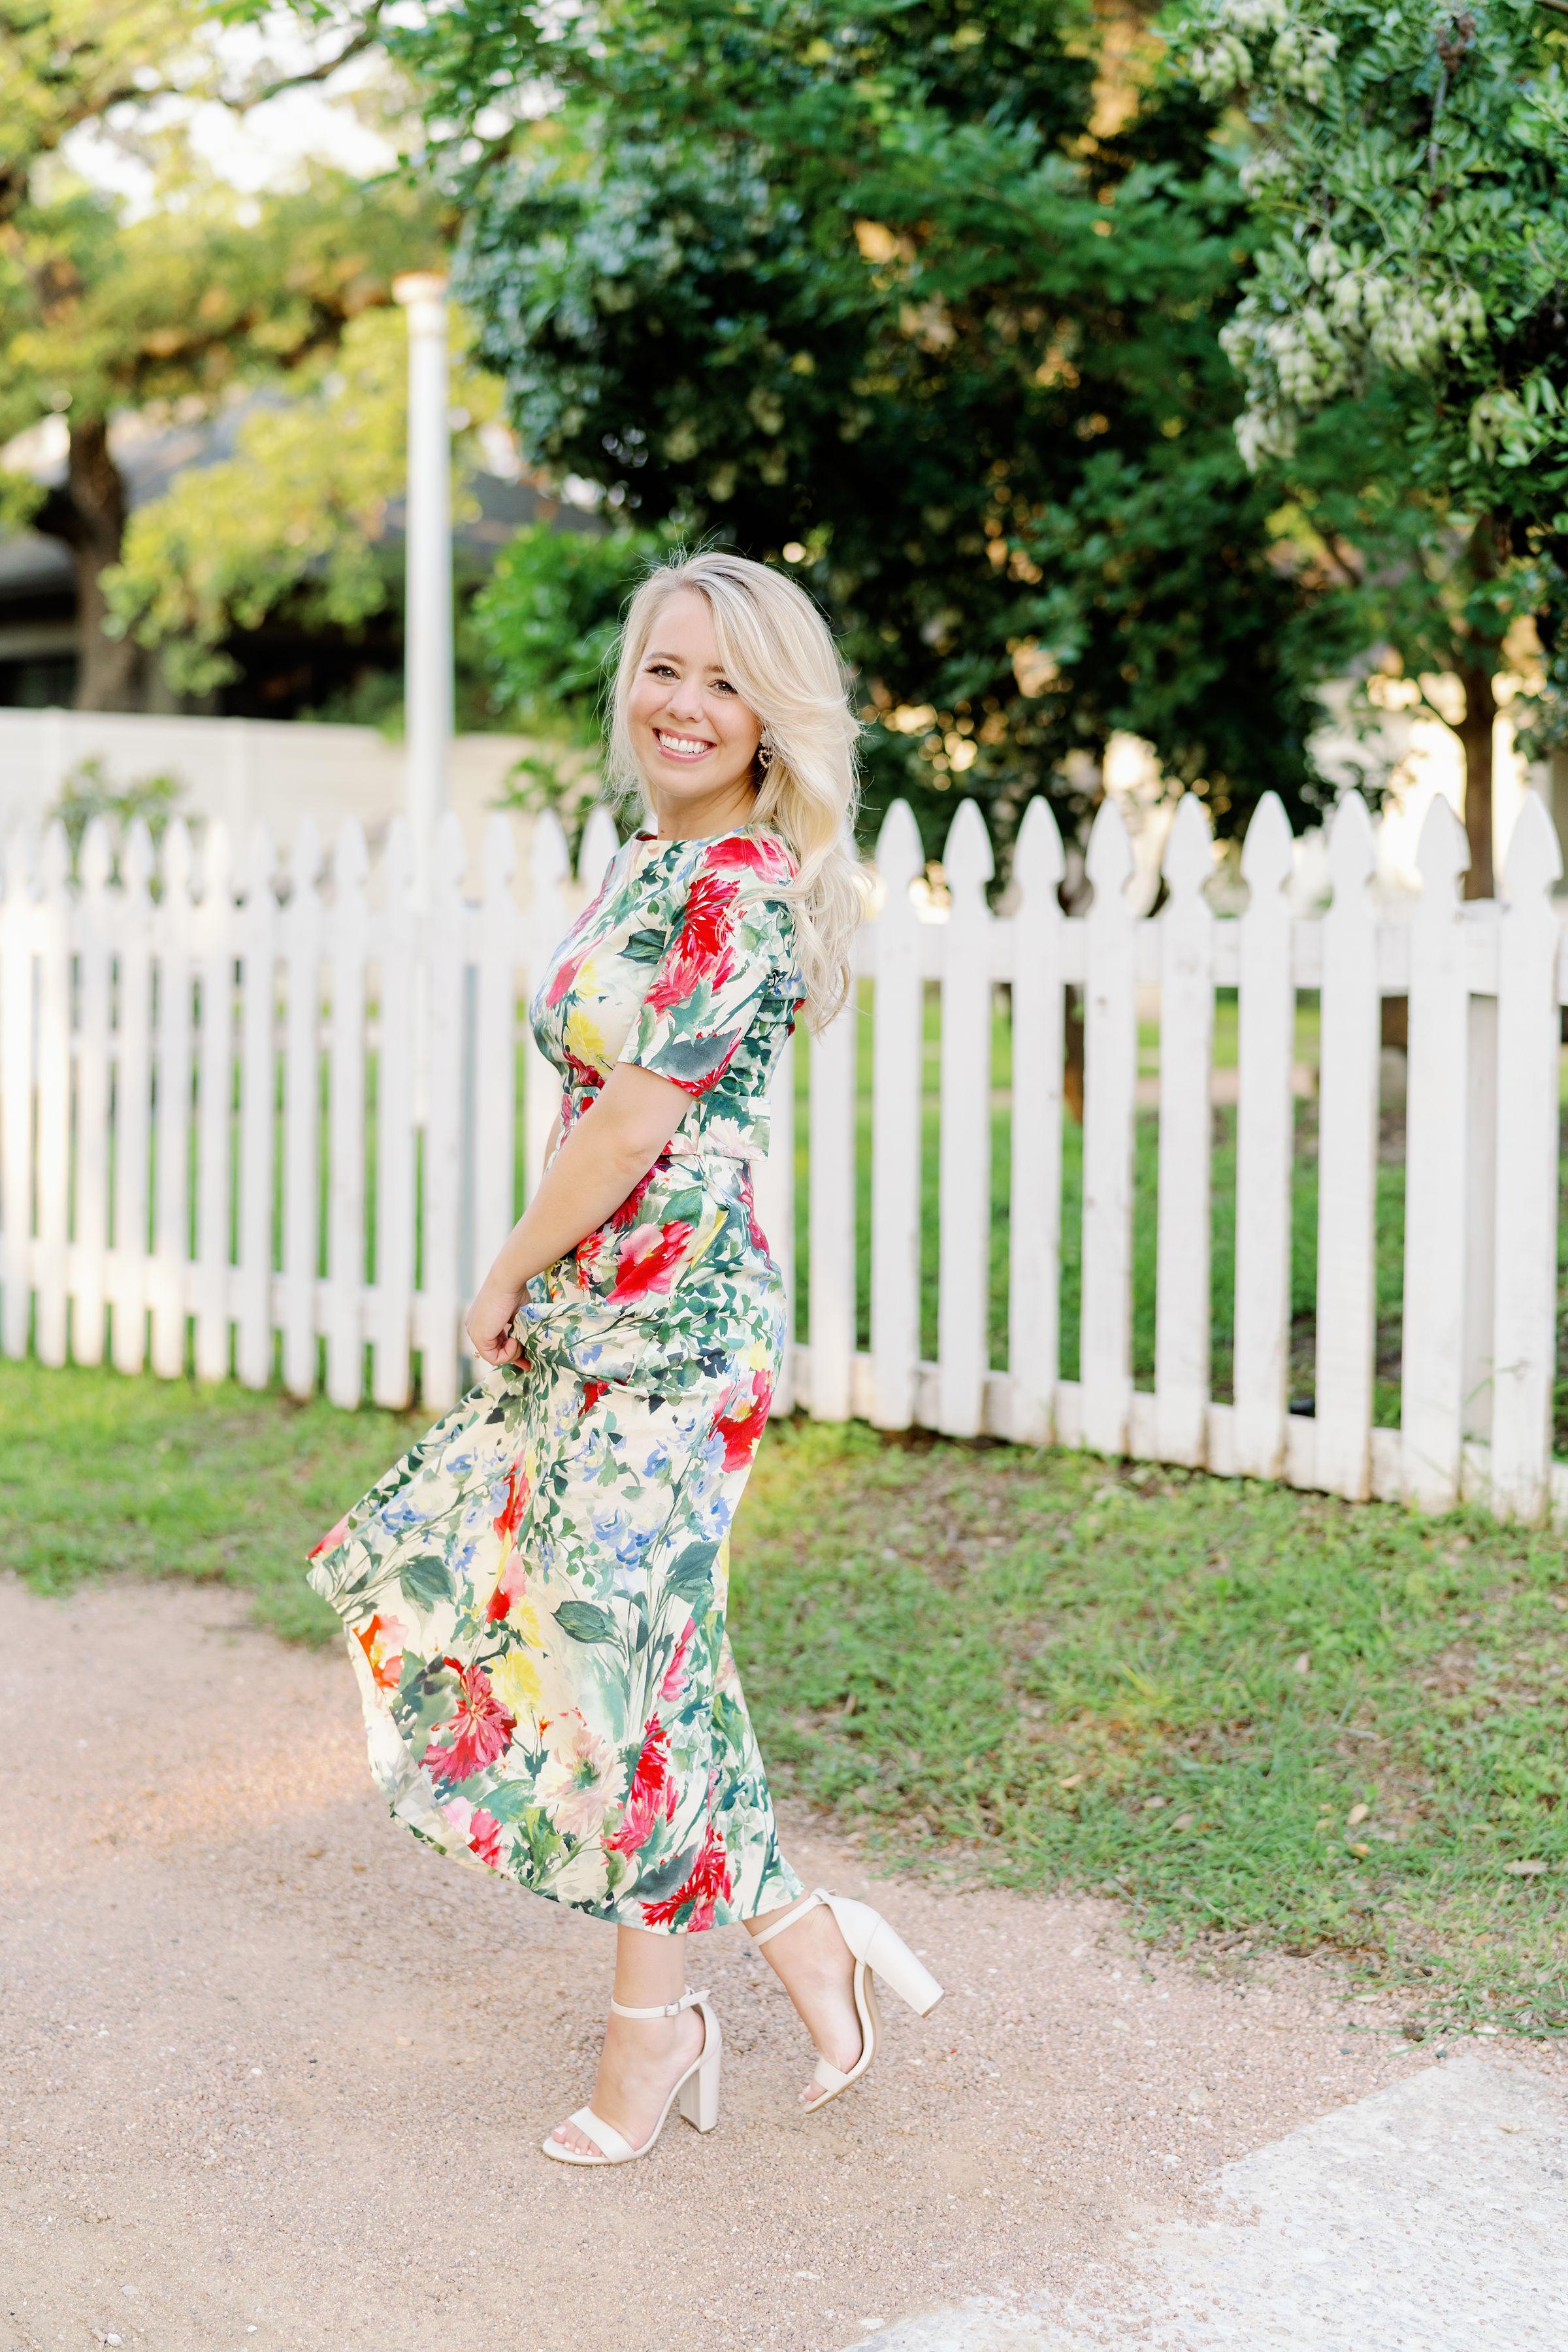 floral dress - Zara